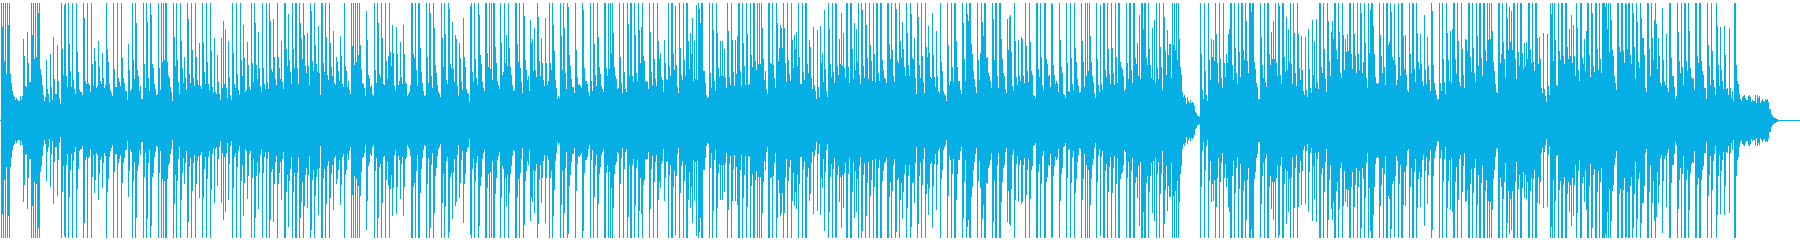 BGM reminiscent of a sad farewell's reproduced waveform